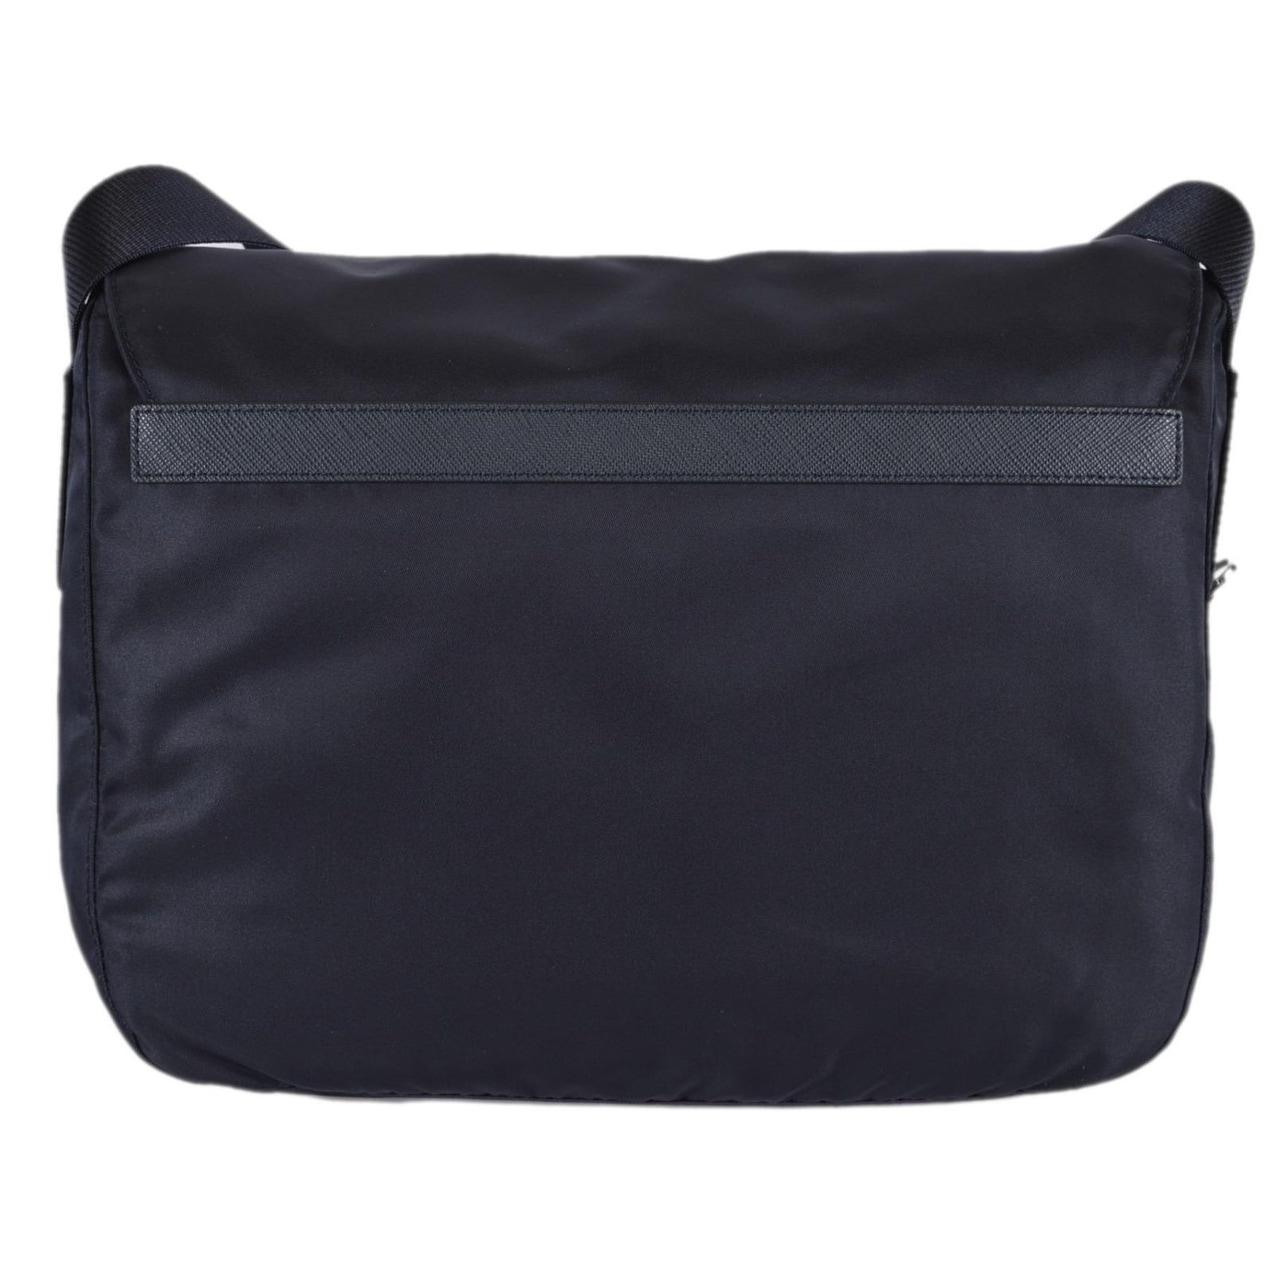 01b091cf1924 Shop Prada Women s 1BD671 Blue Tessuto Nylon Crossbody Purse Bag ...